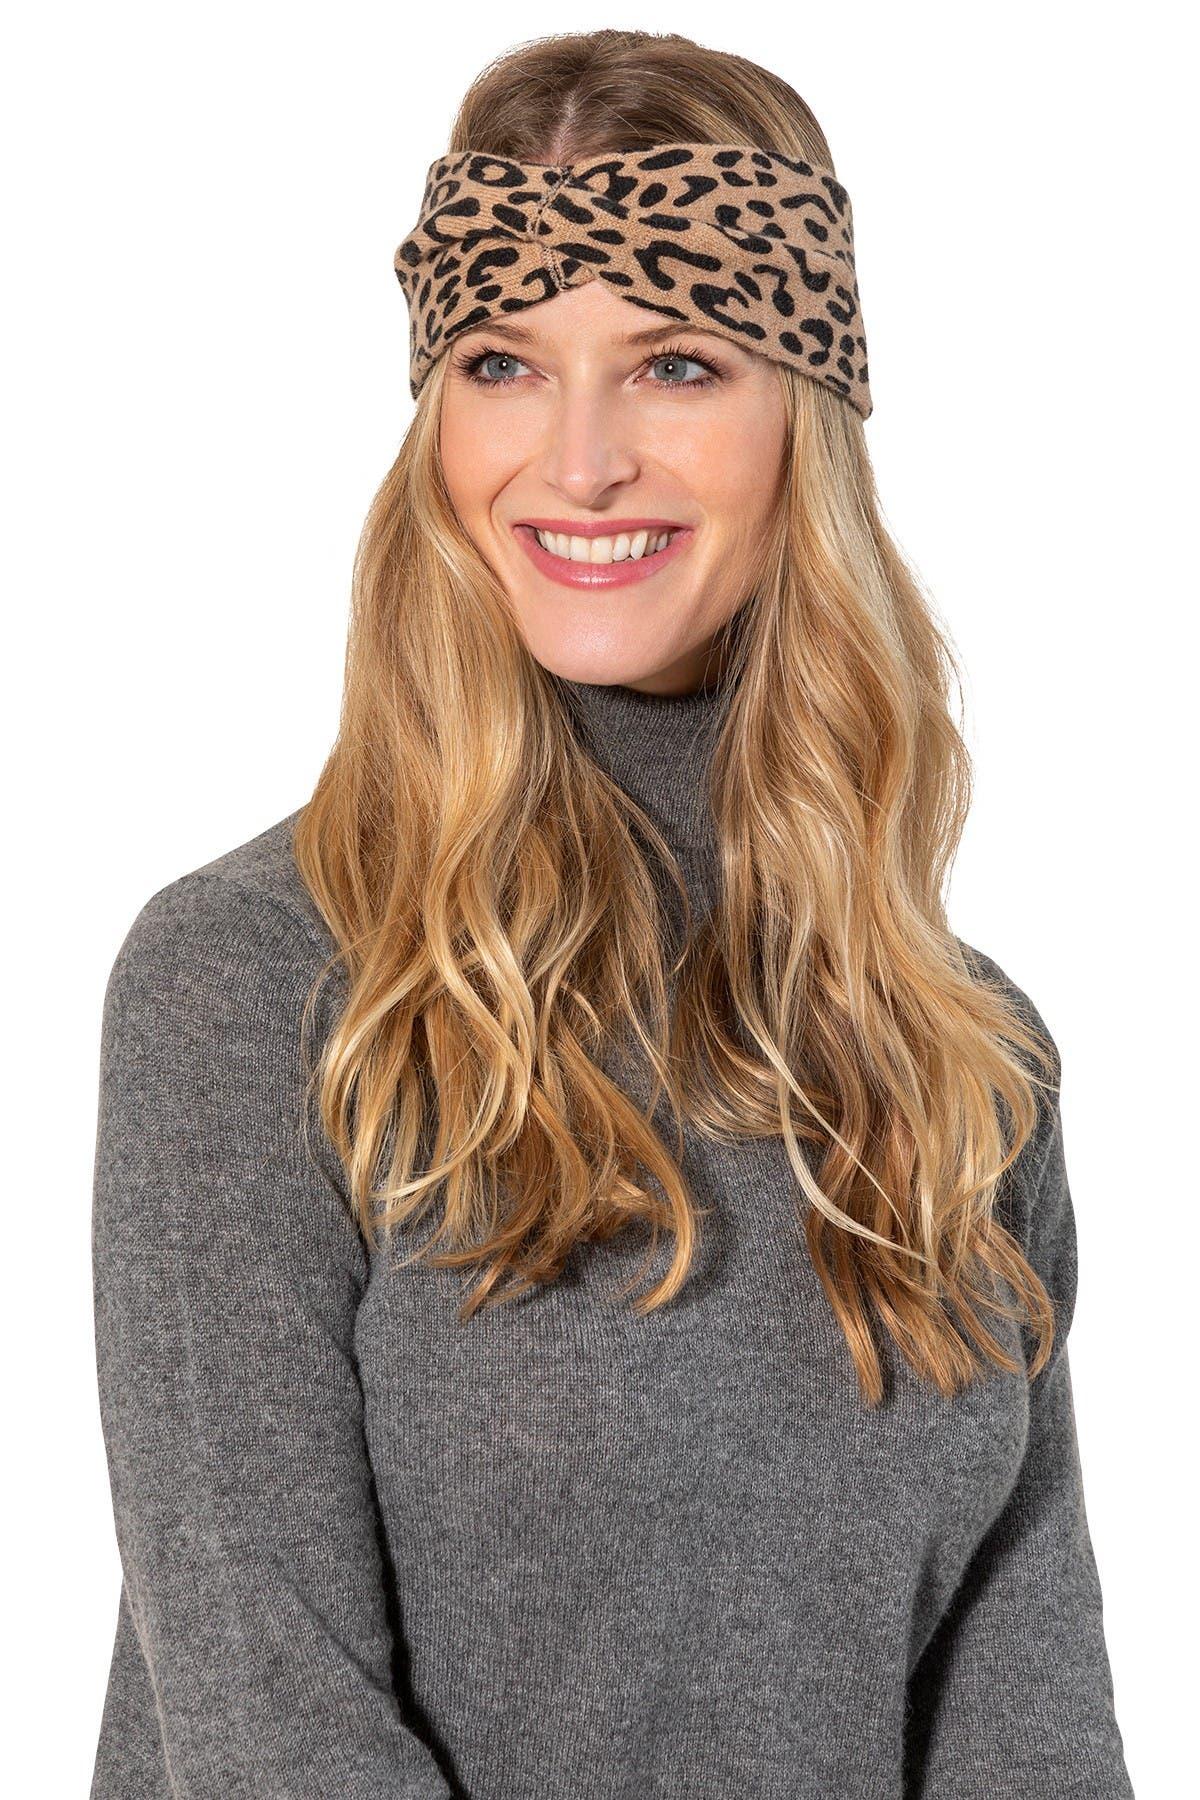 Image of AMICALE Cashmere Animal Print Headband